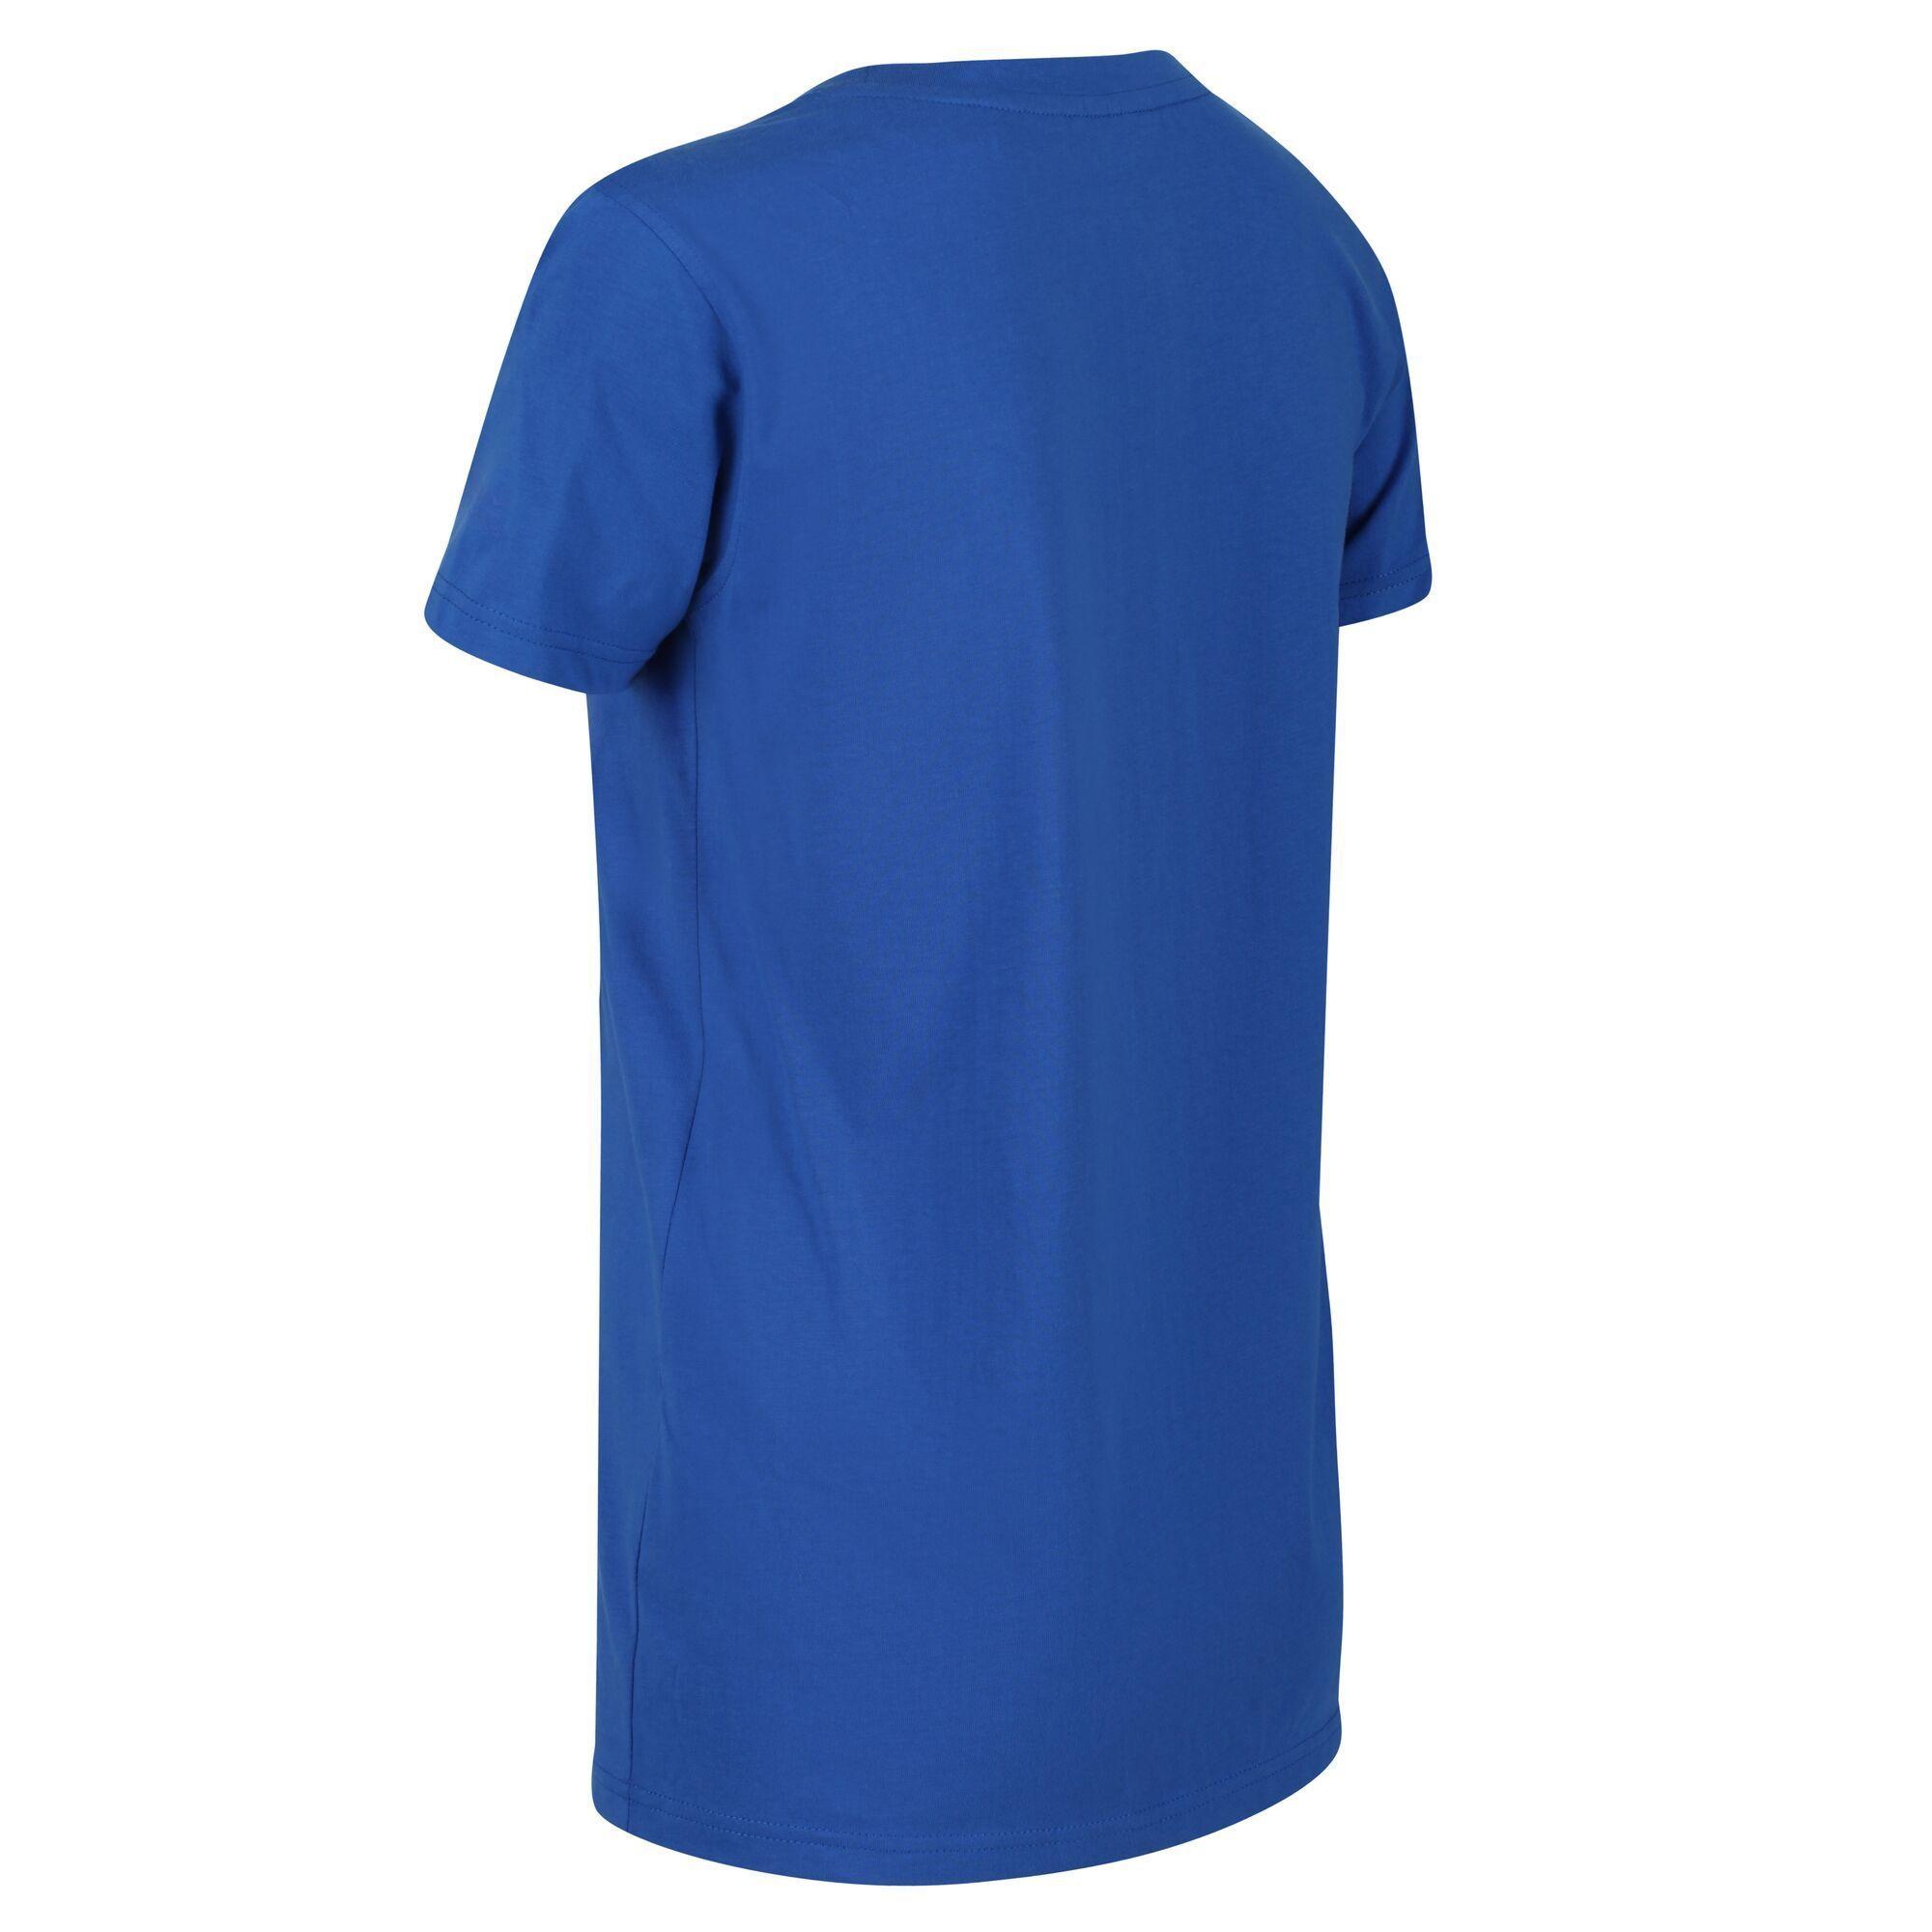 Regatta Womens/Ladies Filandra IV Graphic T-Shirt